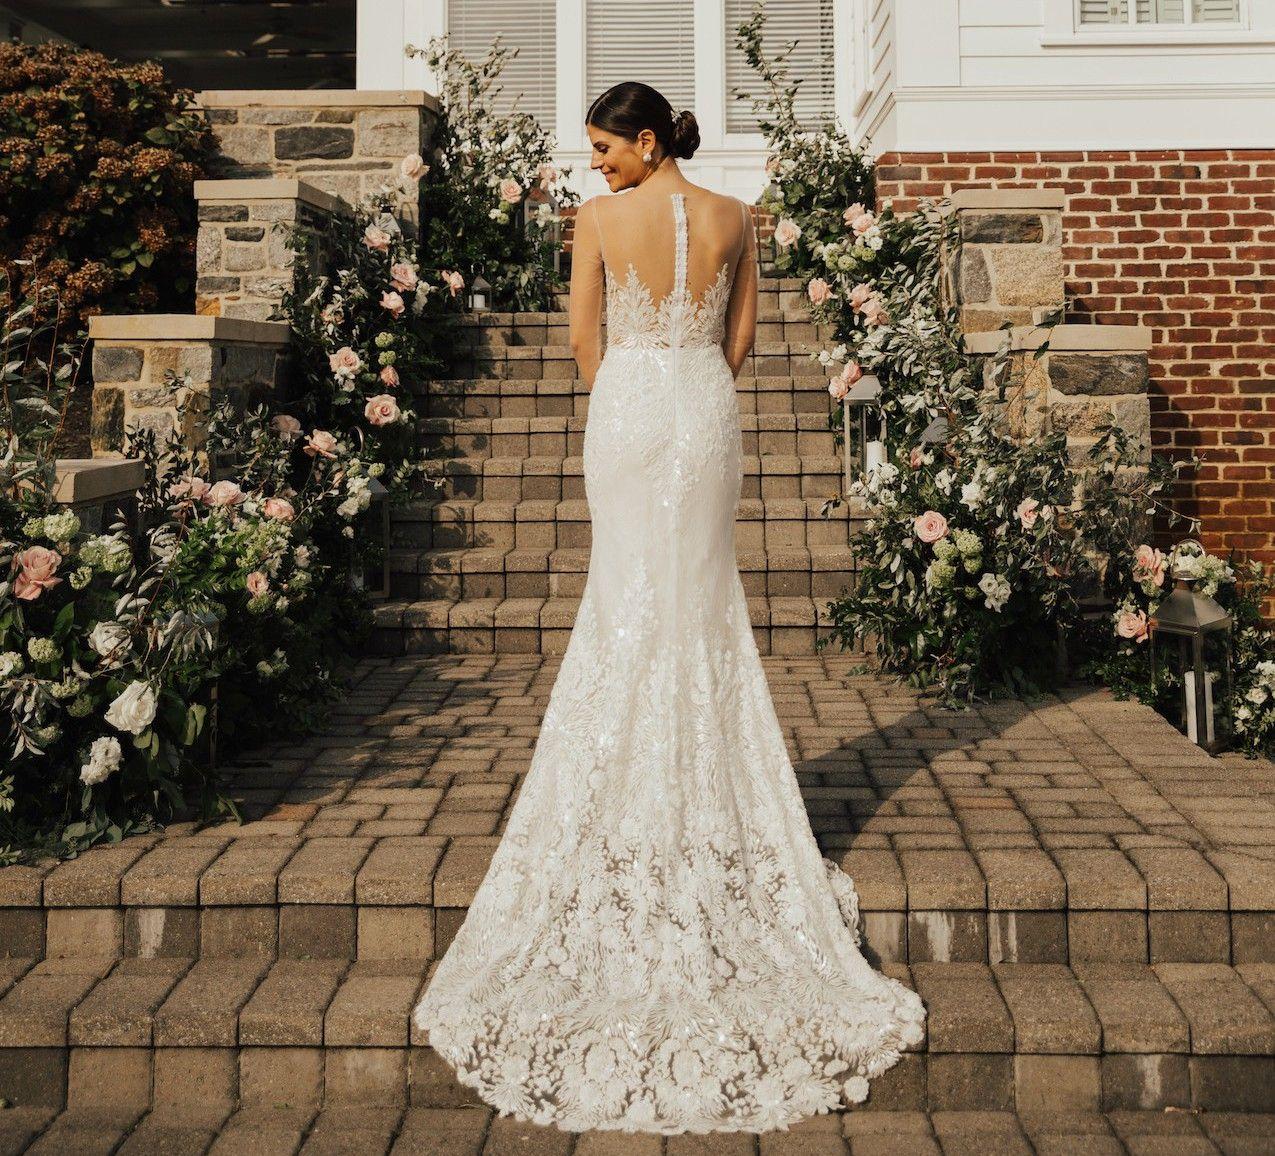 Francesca Miranda Marianina New Wedding Dress Save 90 Francescas Dresses Dresses Wedding Dresses [ 1156 x 1275 Pixel ]